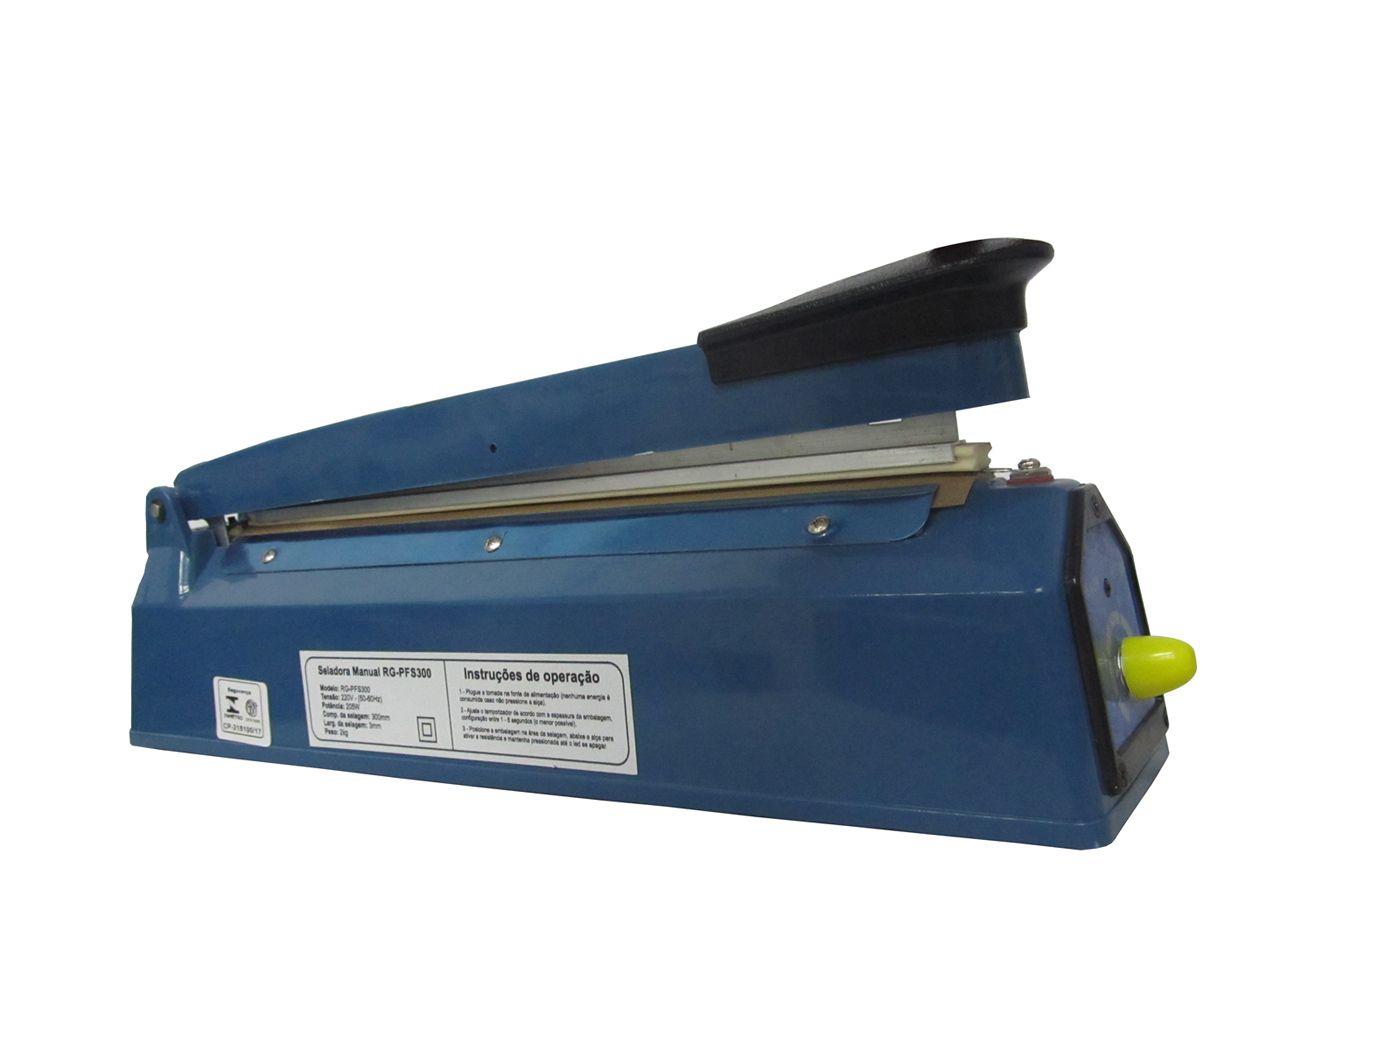 Seladora Manual RG-PFS300 - 110V